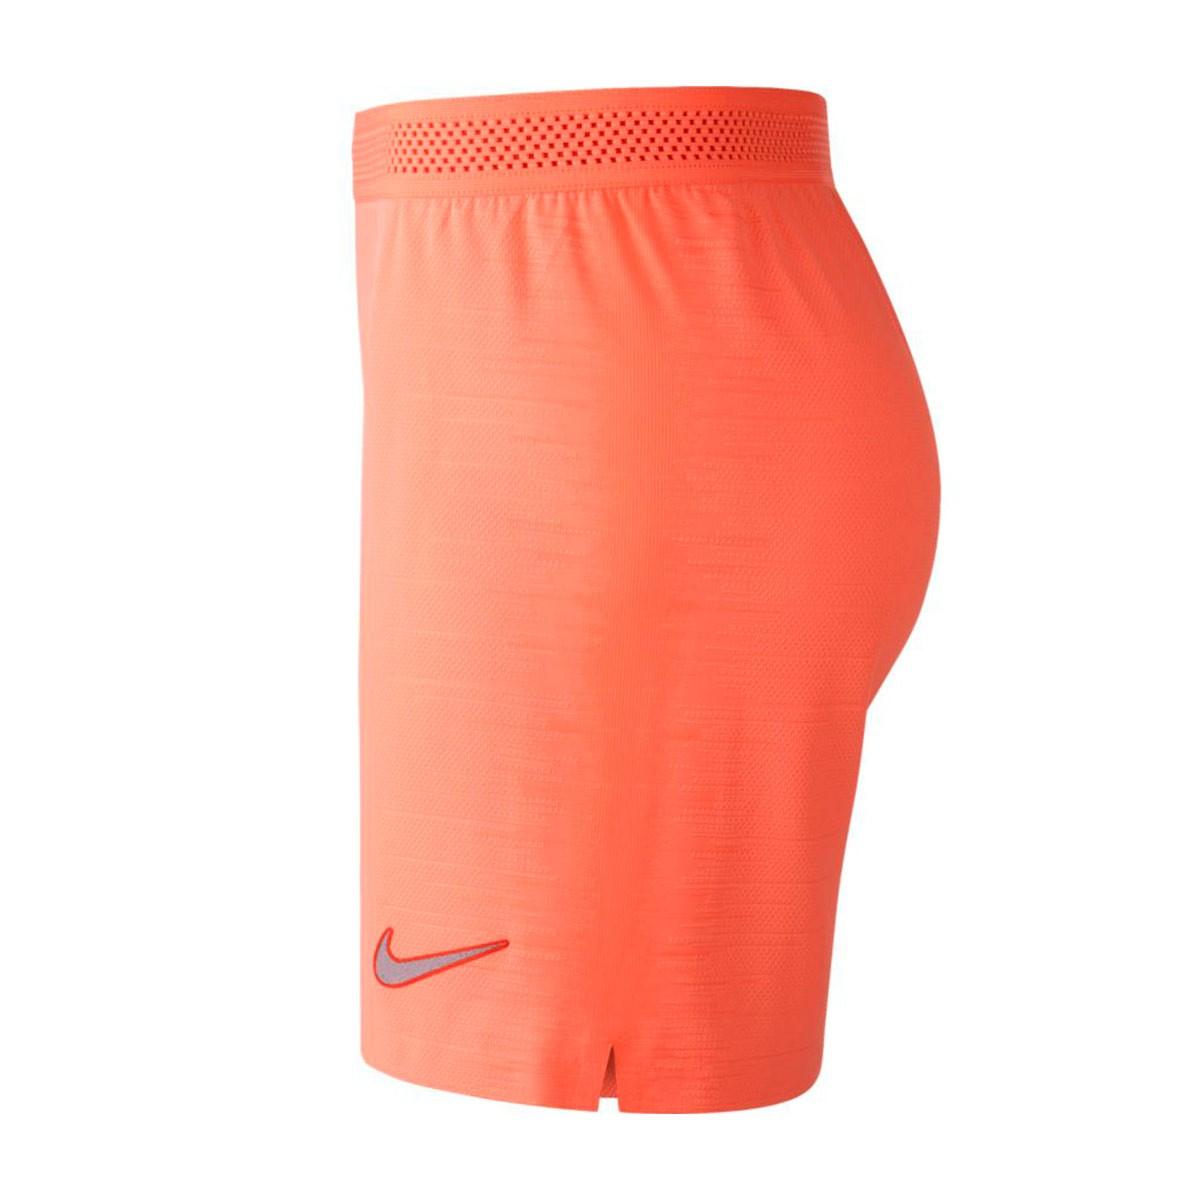 a1da98f4390 Shorts Nike Vapor FC Barcelona Match 2018-2019 Third Light atomic pink- Silver - Football store Fútbol Emotion